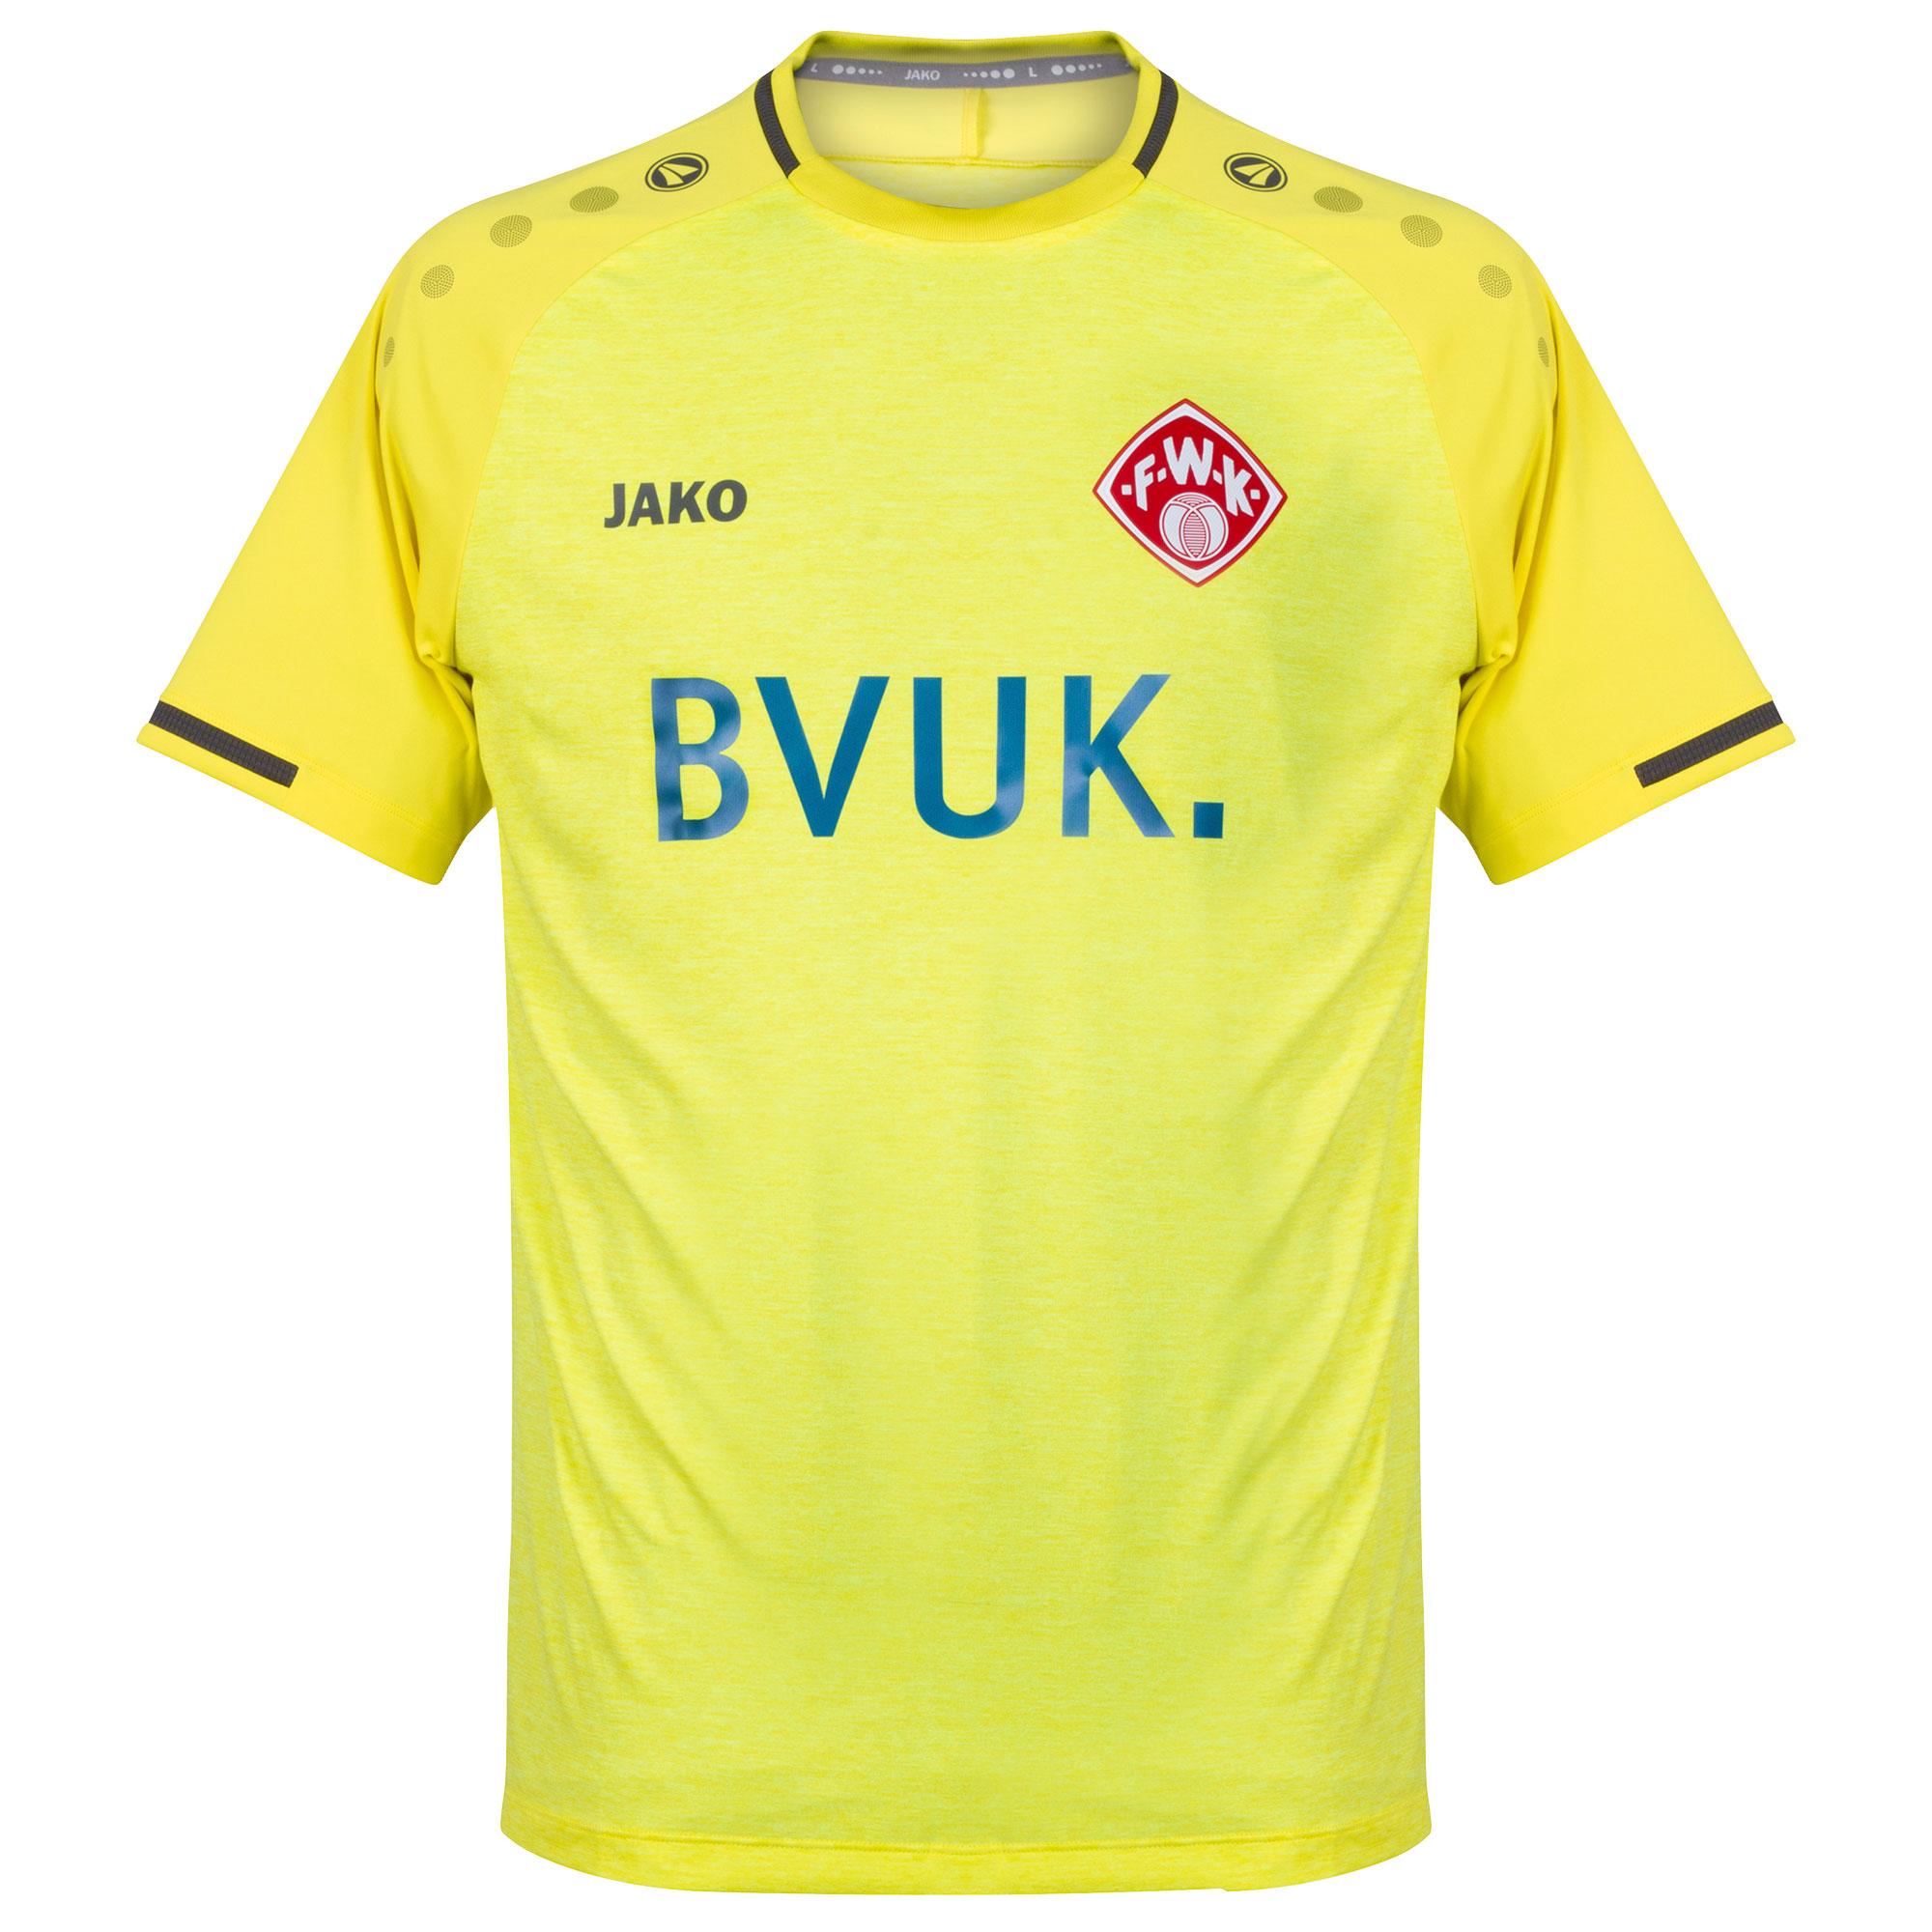 Würzburger Kickers Målvakt tröja